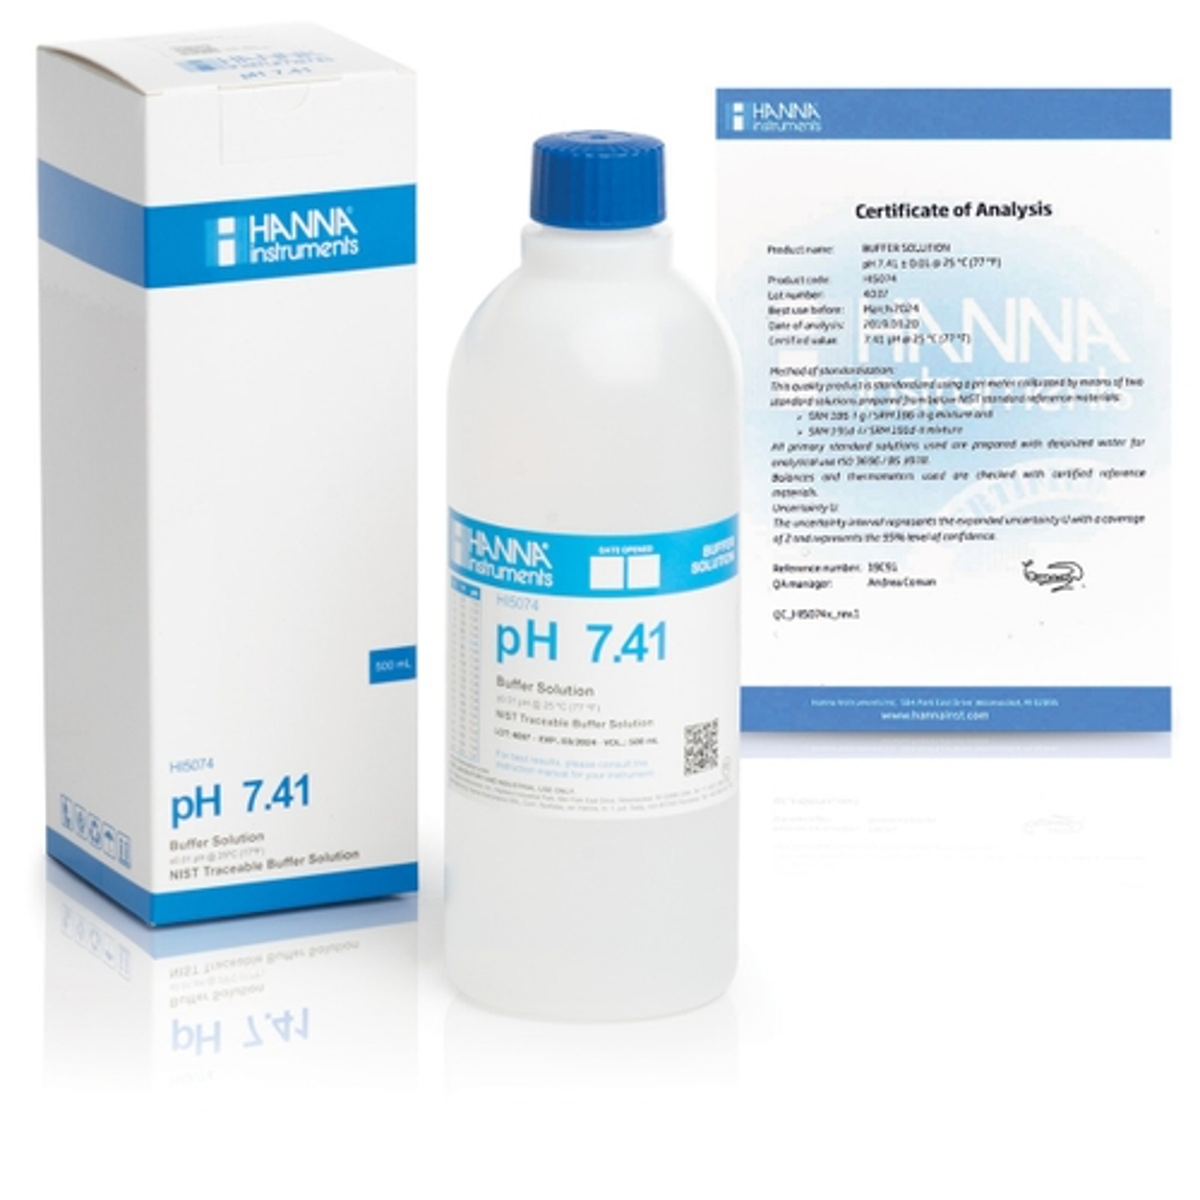 HI5074 pH 7.41 Technical Calibration Buffer (500 mL)